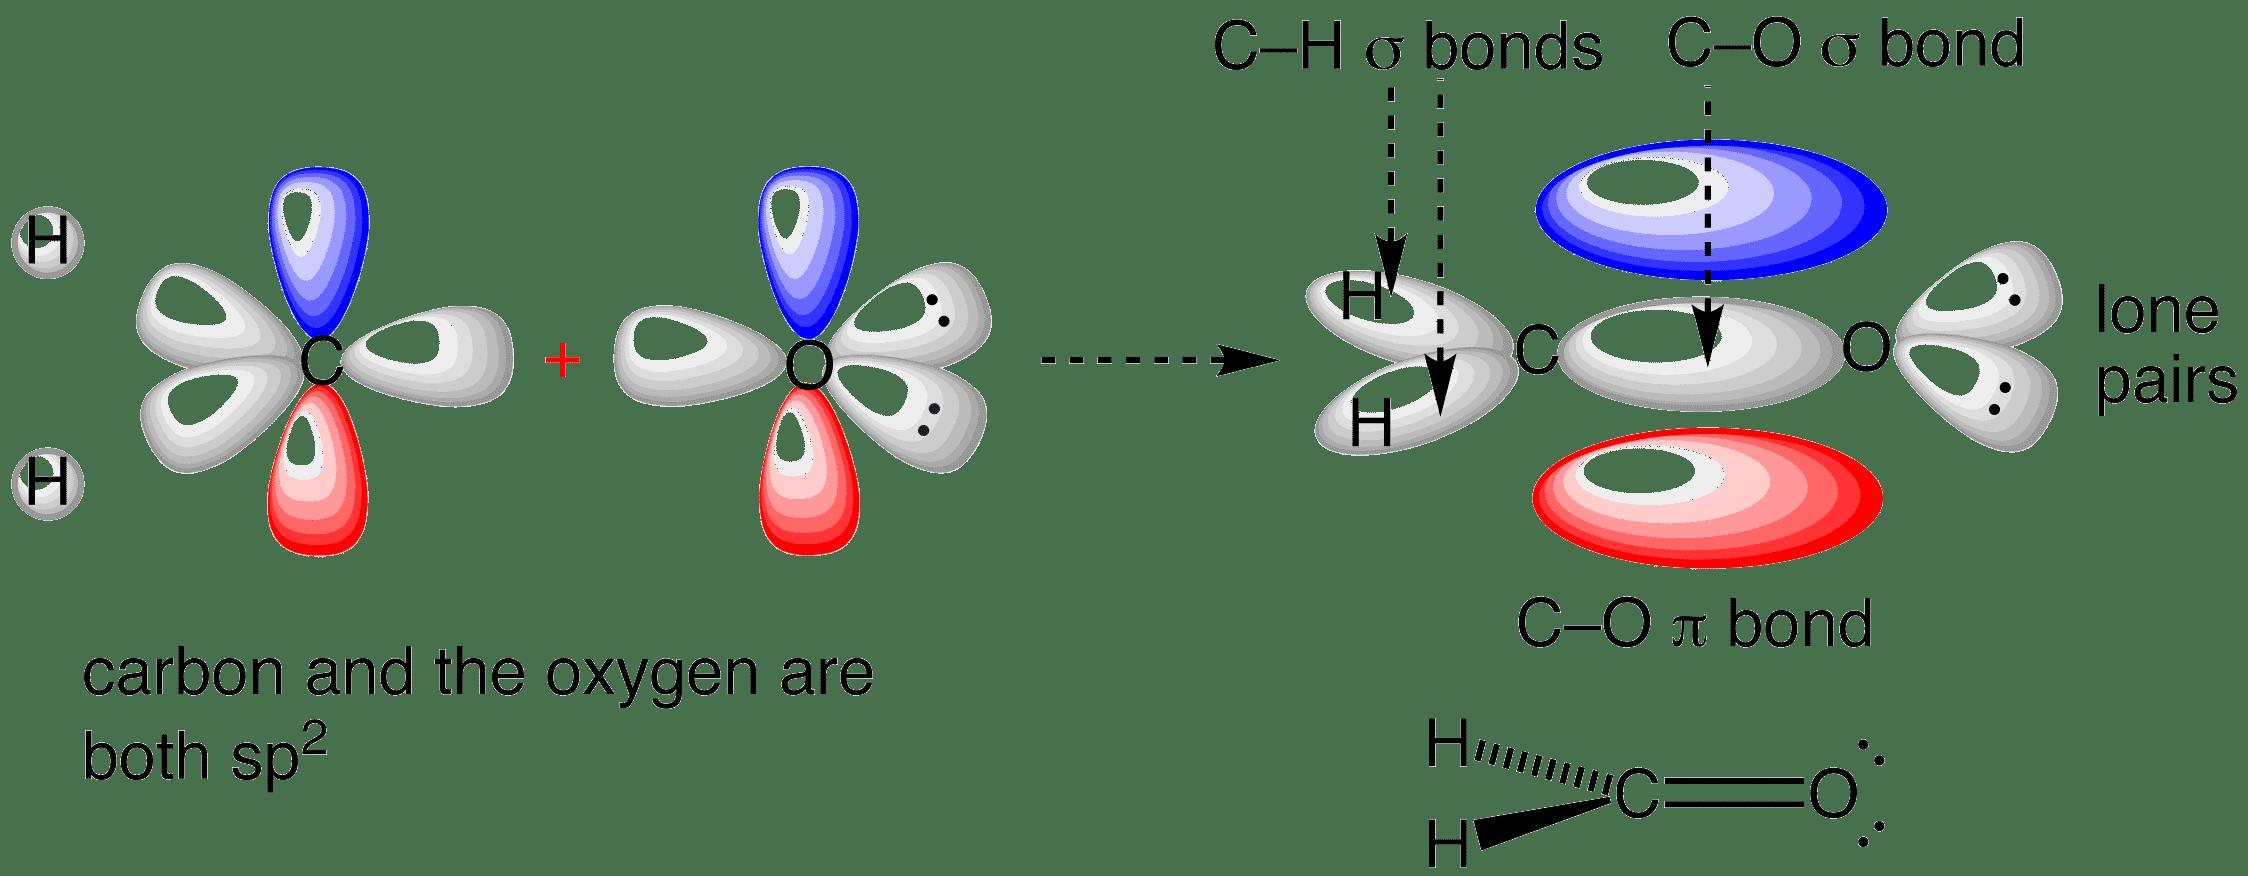 Molecular Orbitals For Carbon Dioxide Part 1 Manual Guide